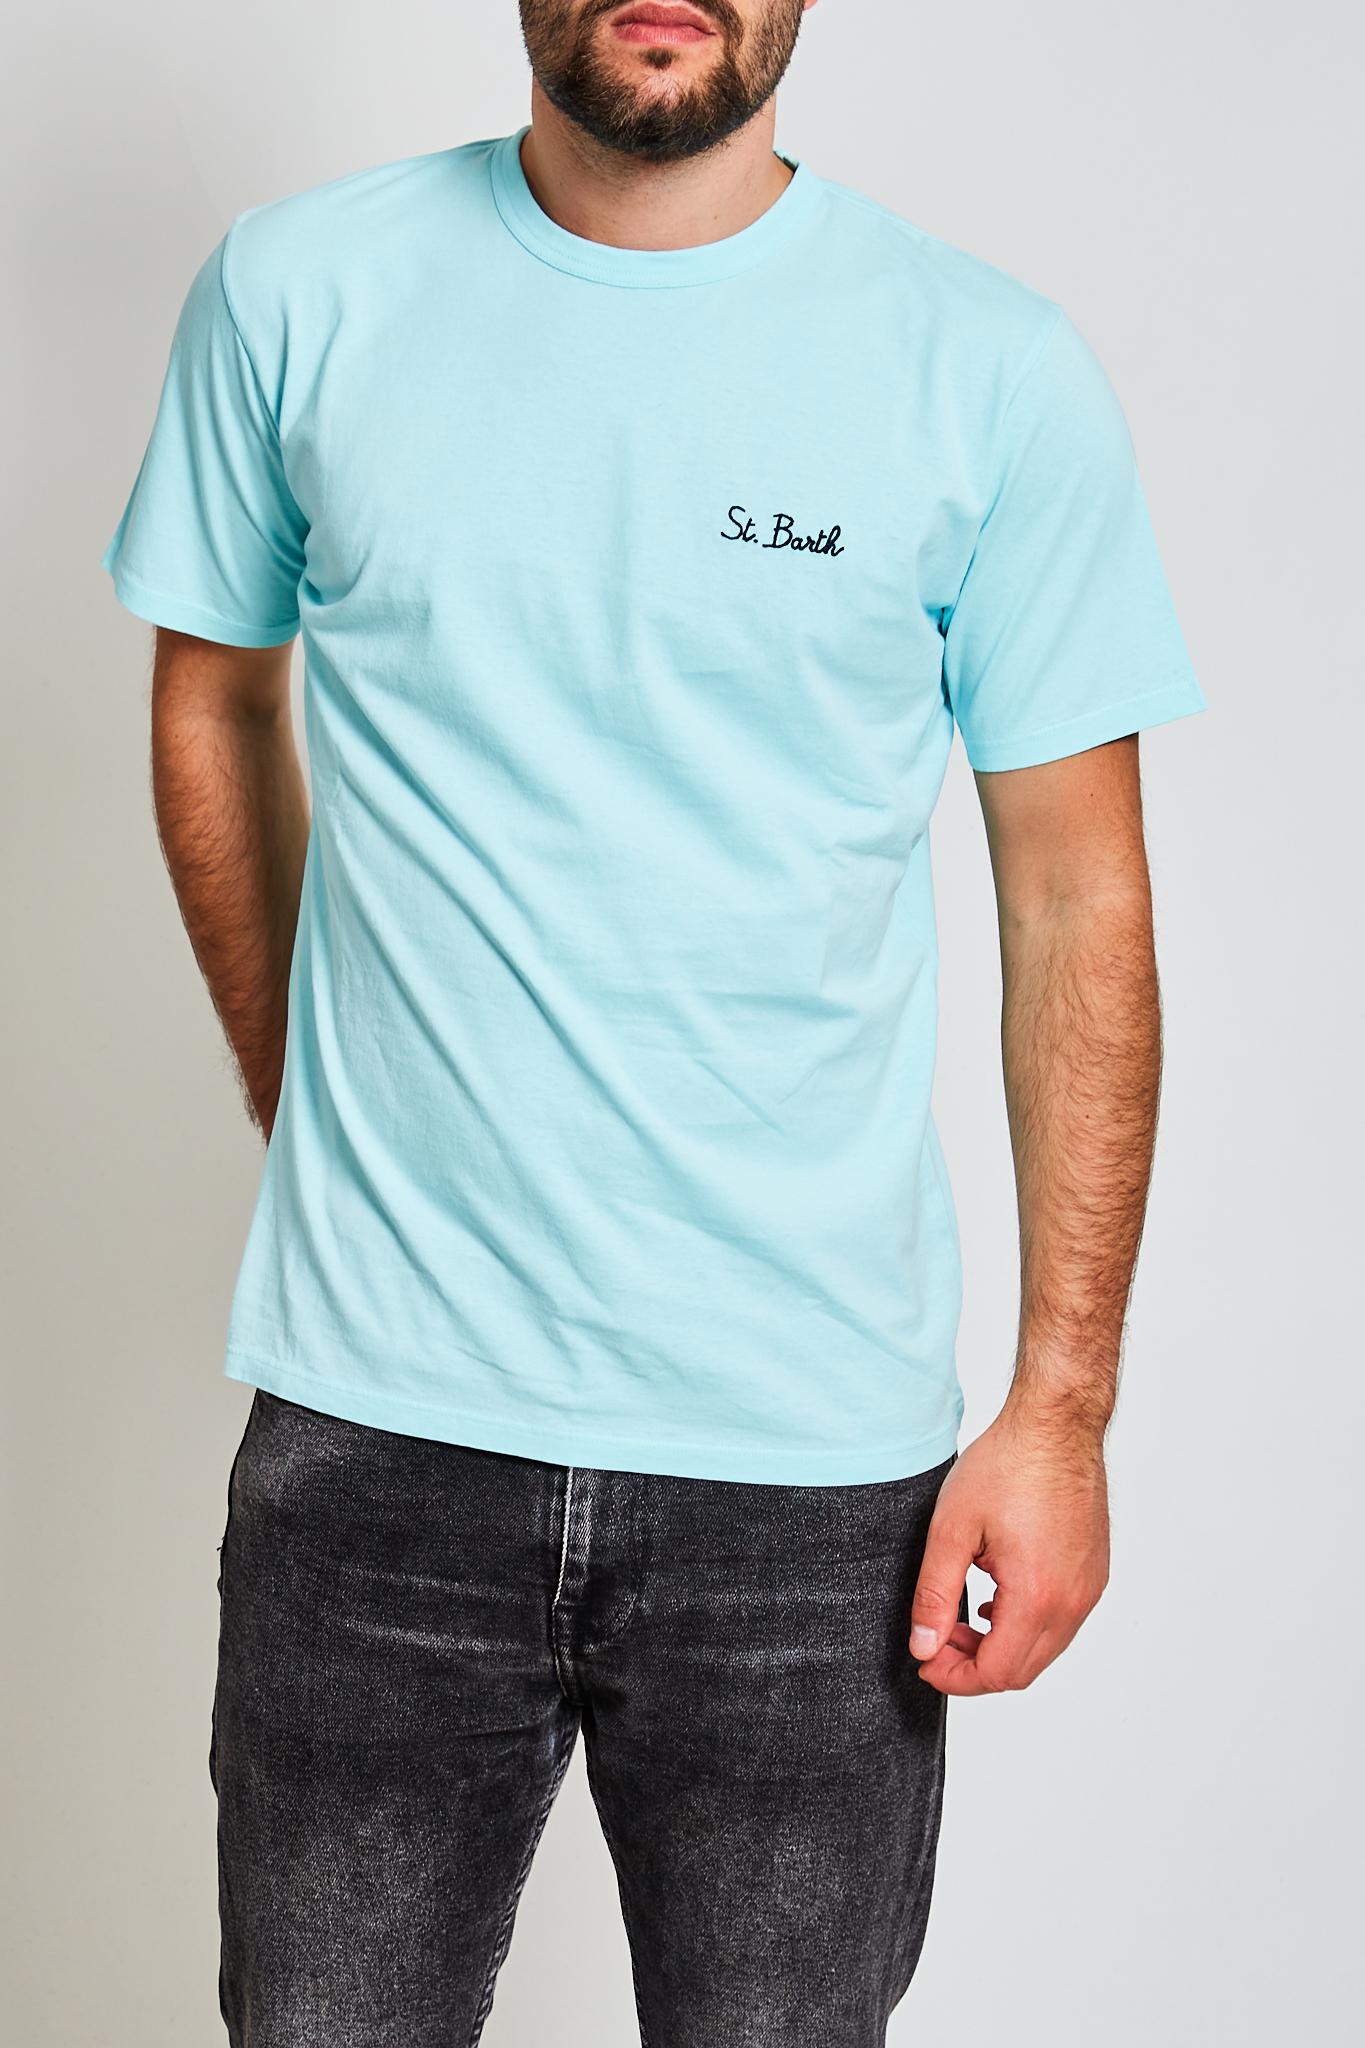 T-shirt MC2 Saint Barth MC2 SAINT BARTH   T-shirt   DOVERSB5661